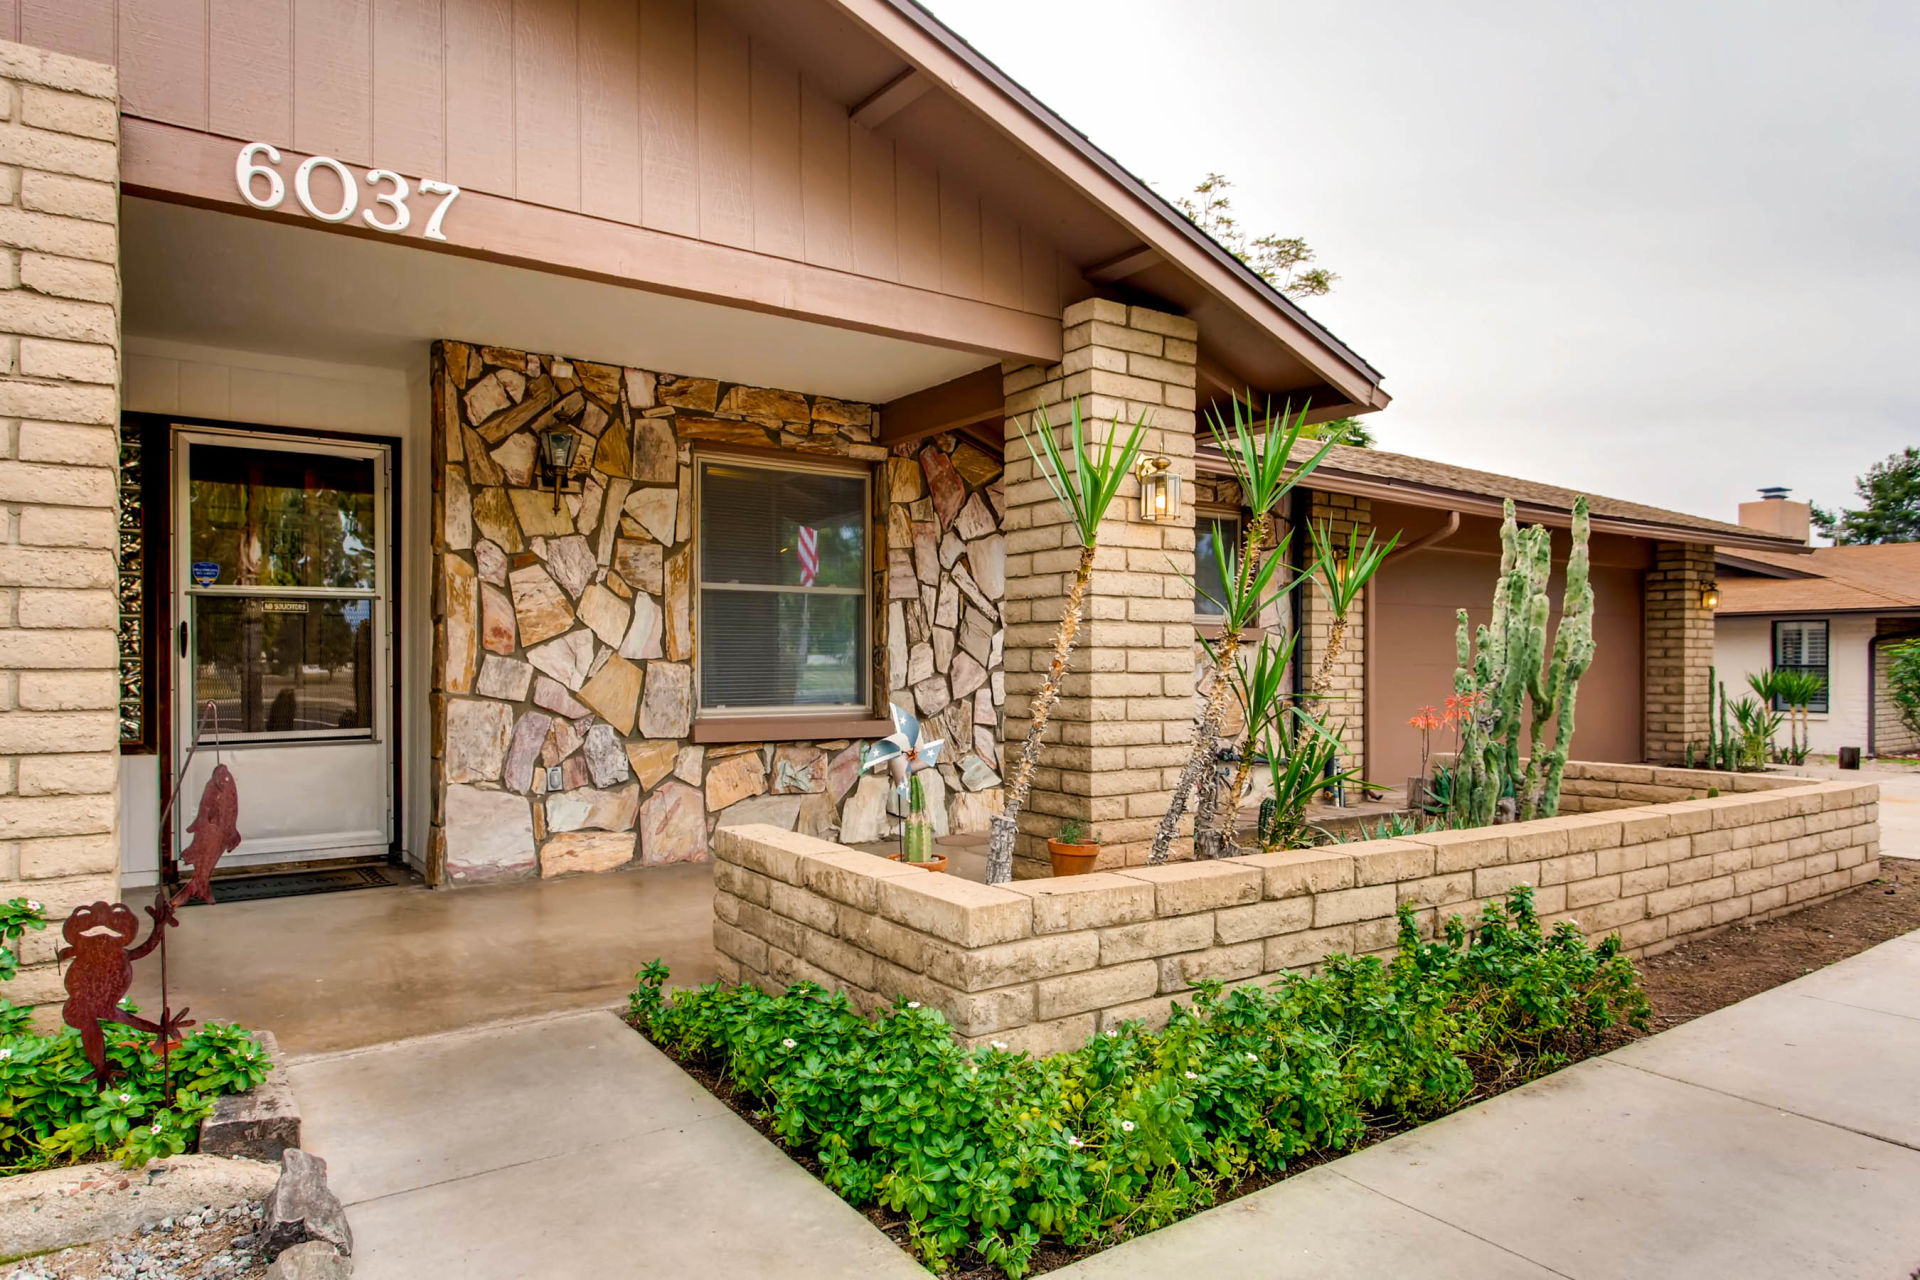 OPEN HOUSE 6037 E McLellan Rd Mesa AZ 85205